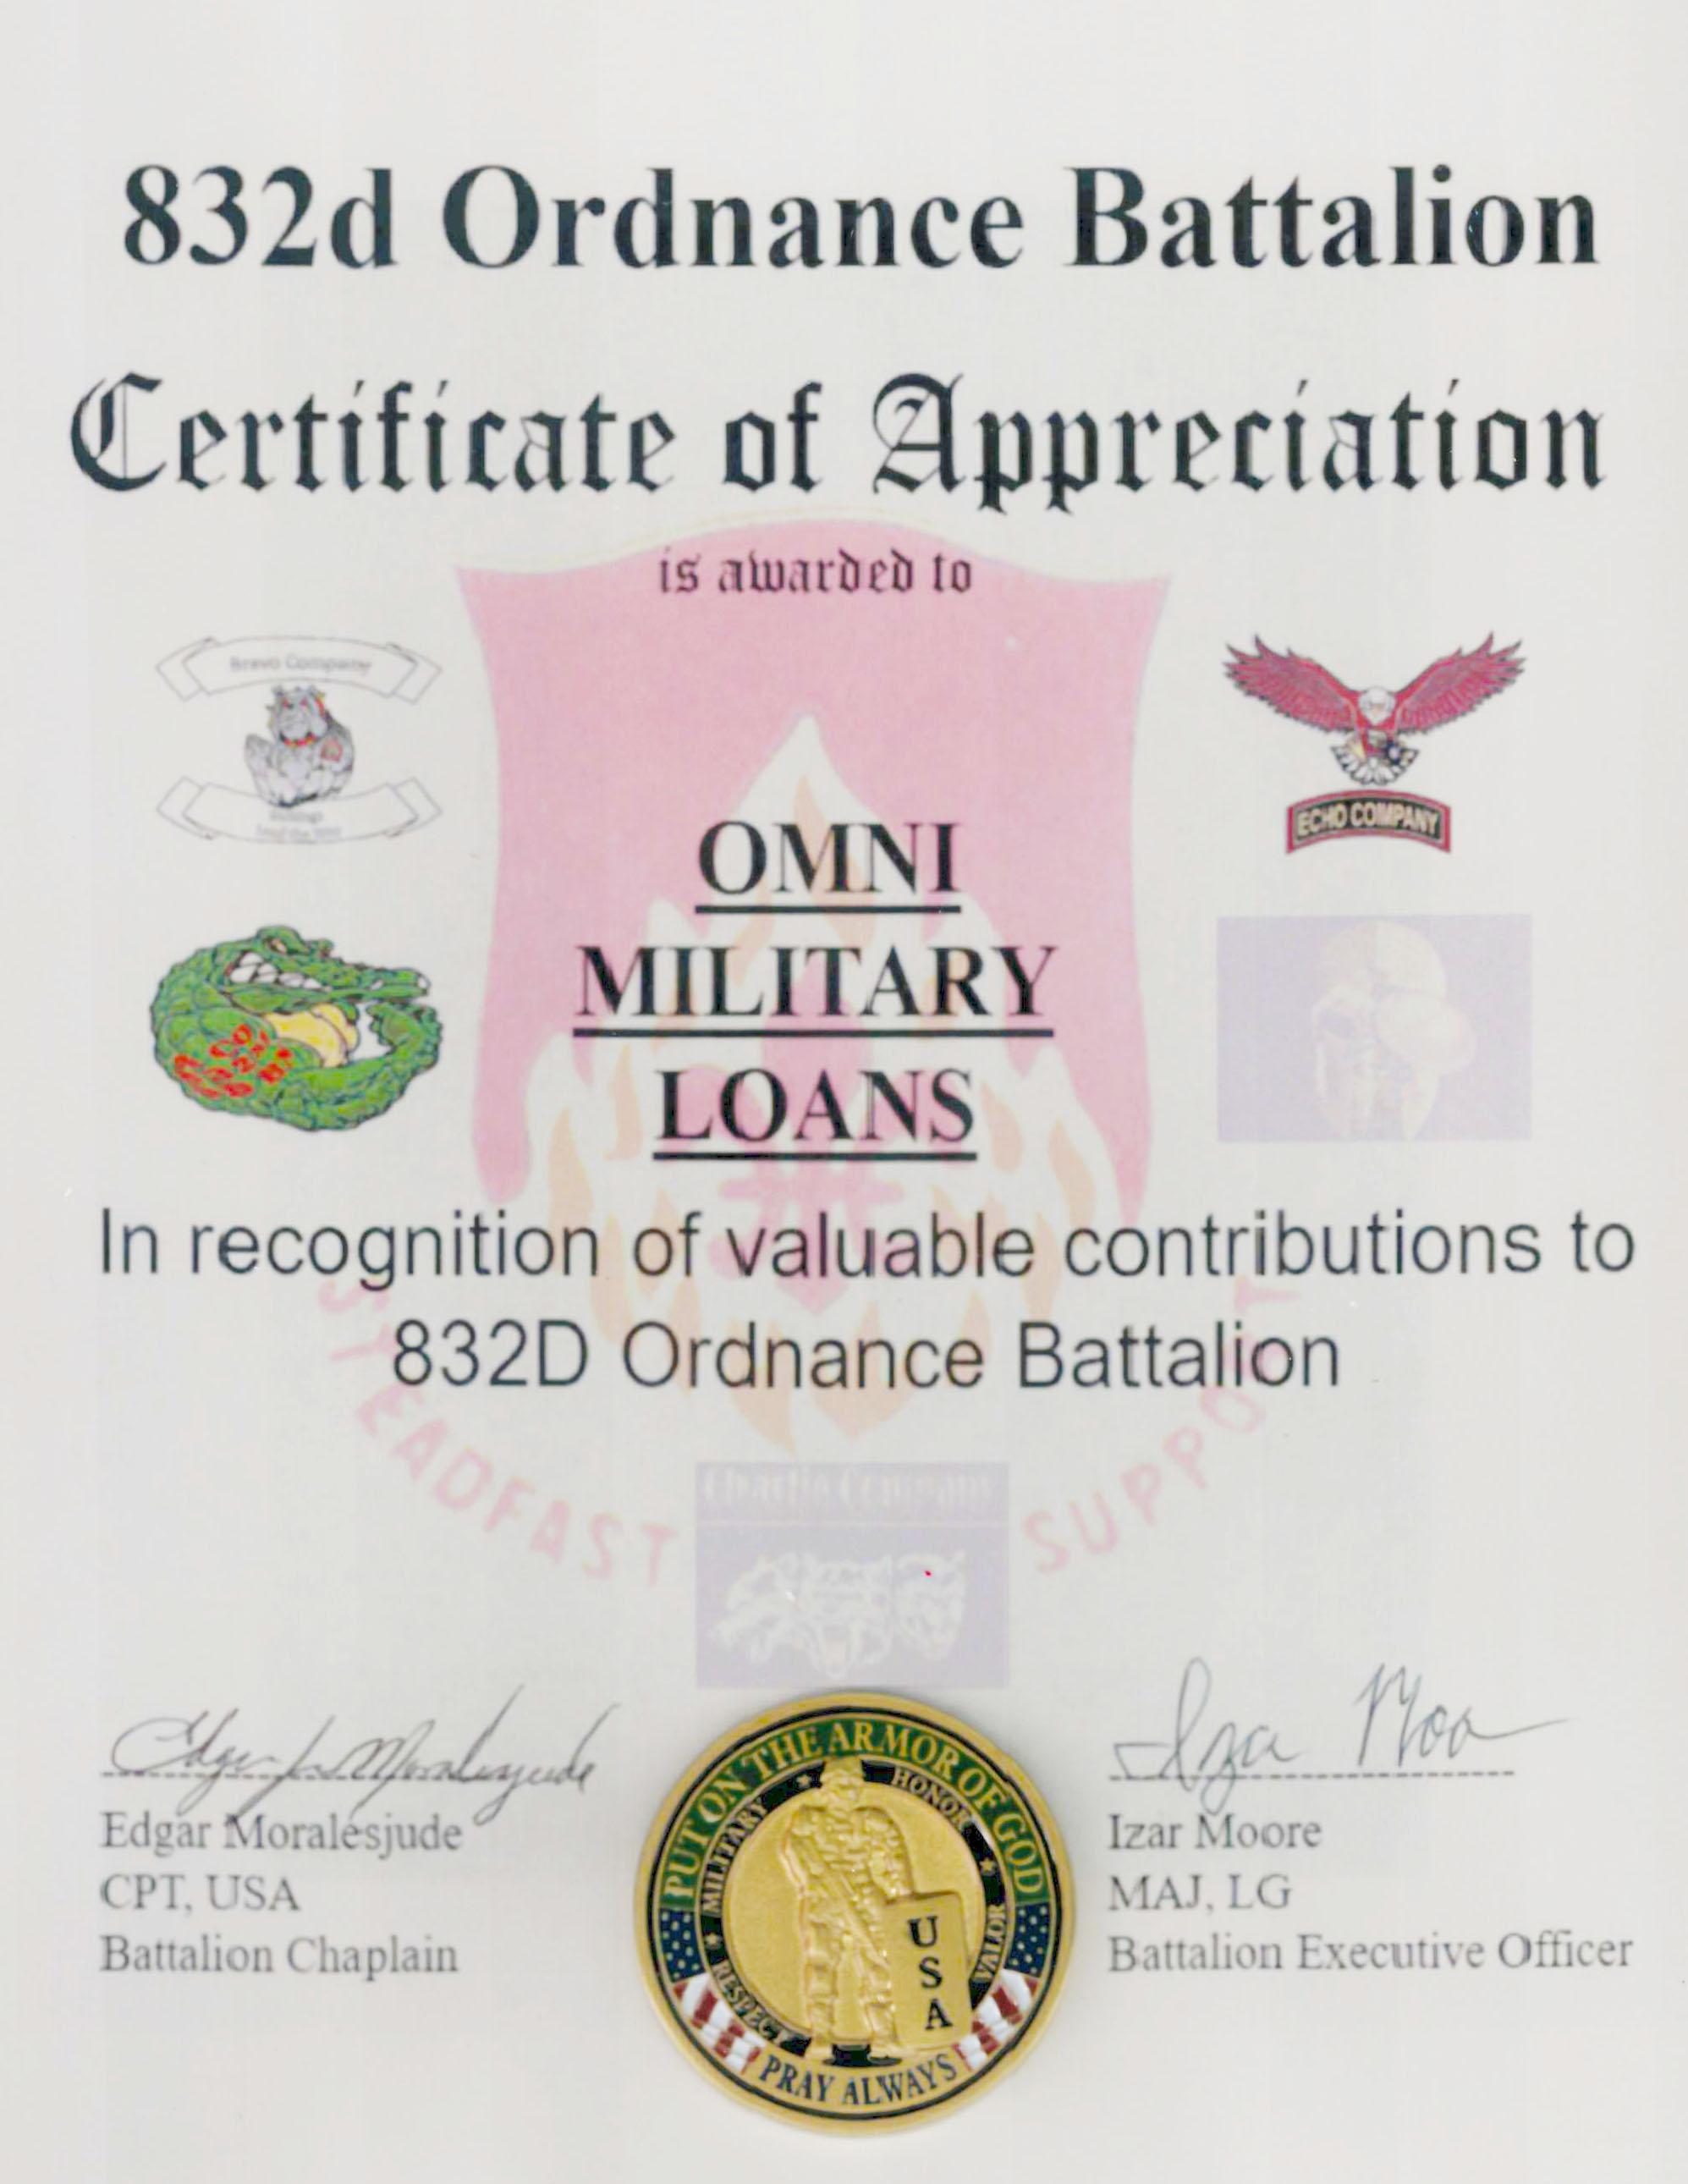 Omni military loans in prince george va 832nd ordnance battalion certificate of appreciation jan 2018 xflitez Choice Image